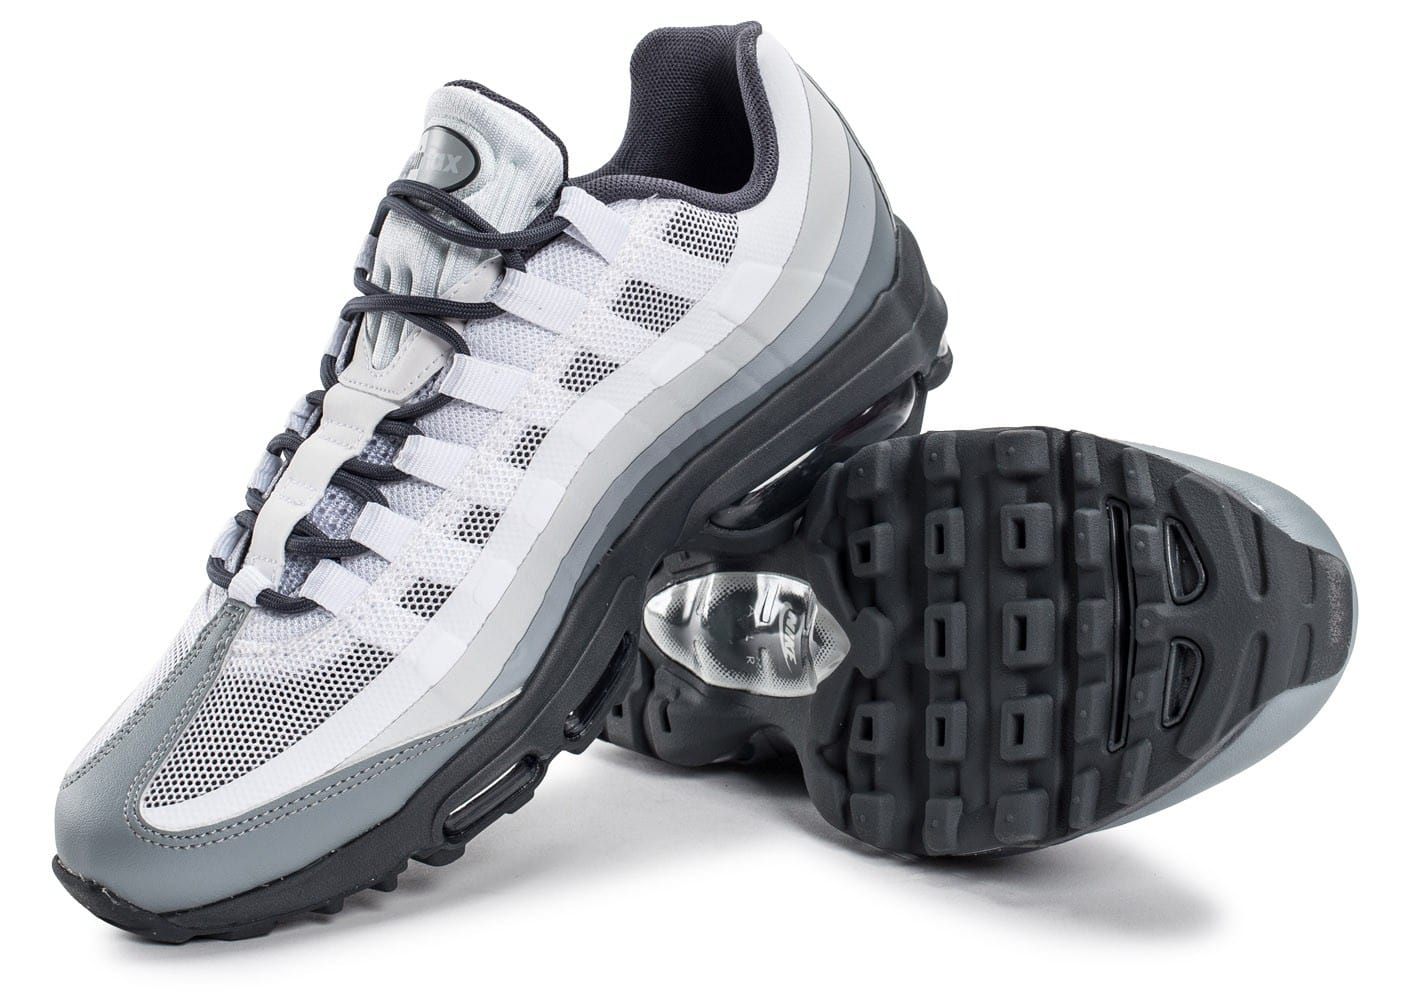 online store 14a4c 9c128 Nike Sportswear Air Max 95 Ultra femme - chaussures pour femme - blanc-menthe-bleu.  Rabais Homme 93509 Nike Air Max 95 Ultra Essential ...